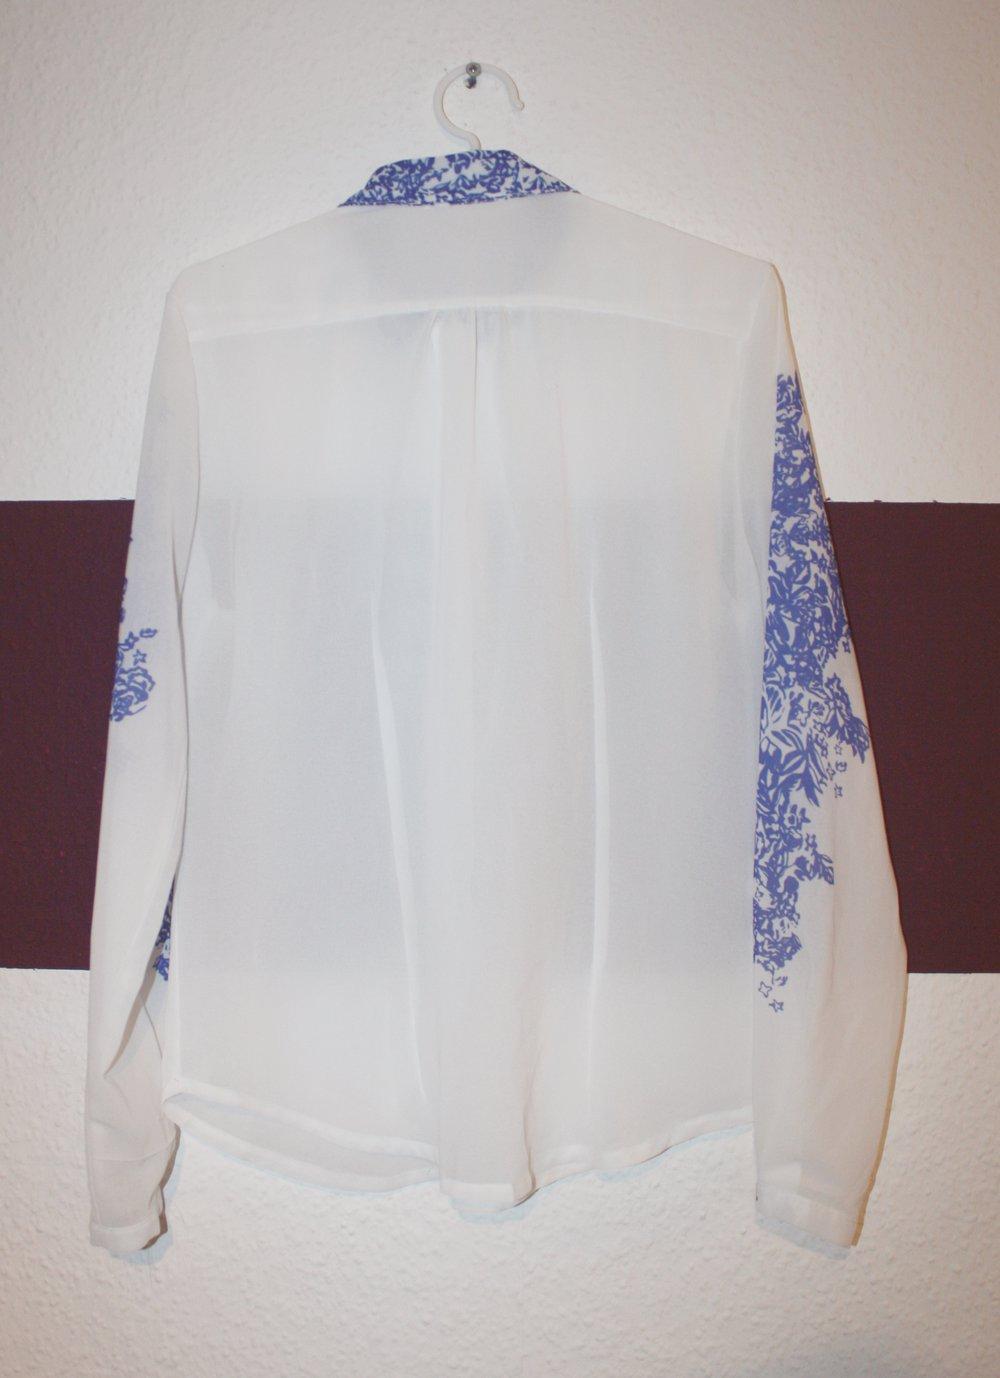 70dccbfc64d8 halbtransparente Bluse   Hemd, Button Down Kragen, Perlmut Knopfleiste,  florales ethno Muster in ...